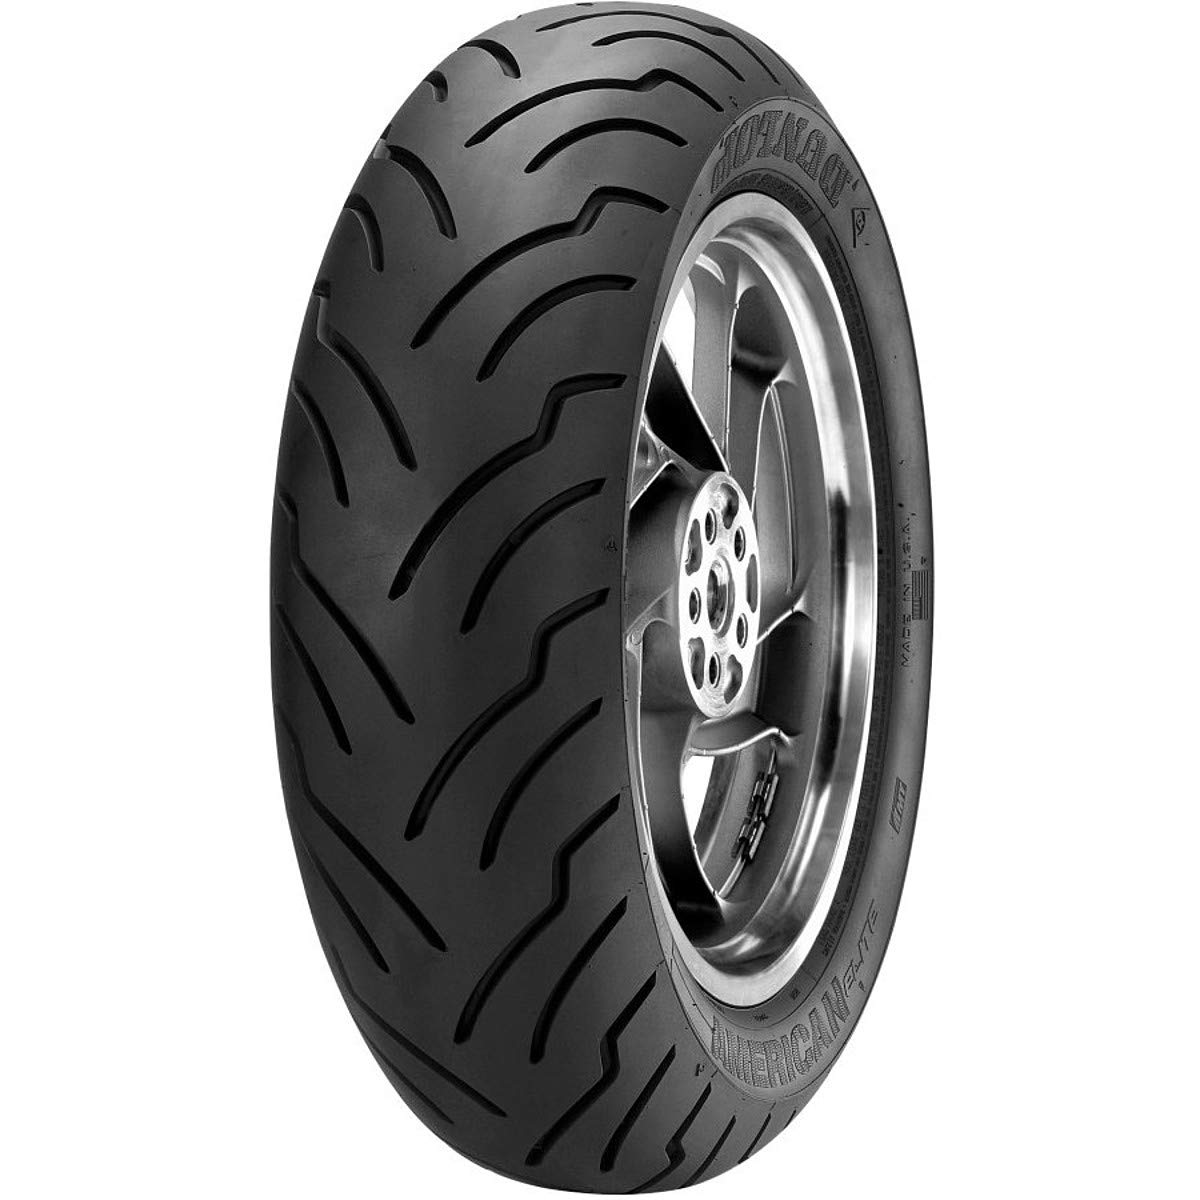 Dunlop American Elite Rear Tire 180//65-16B